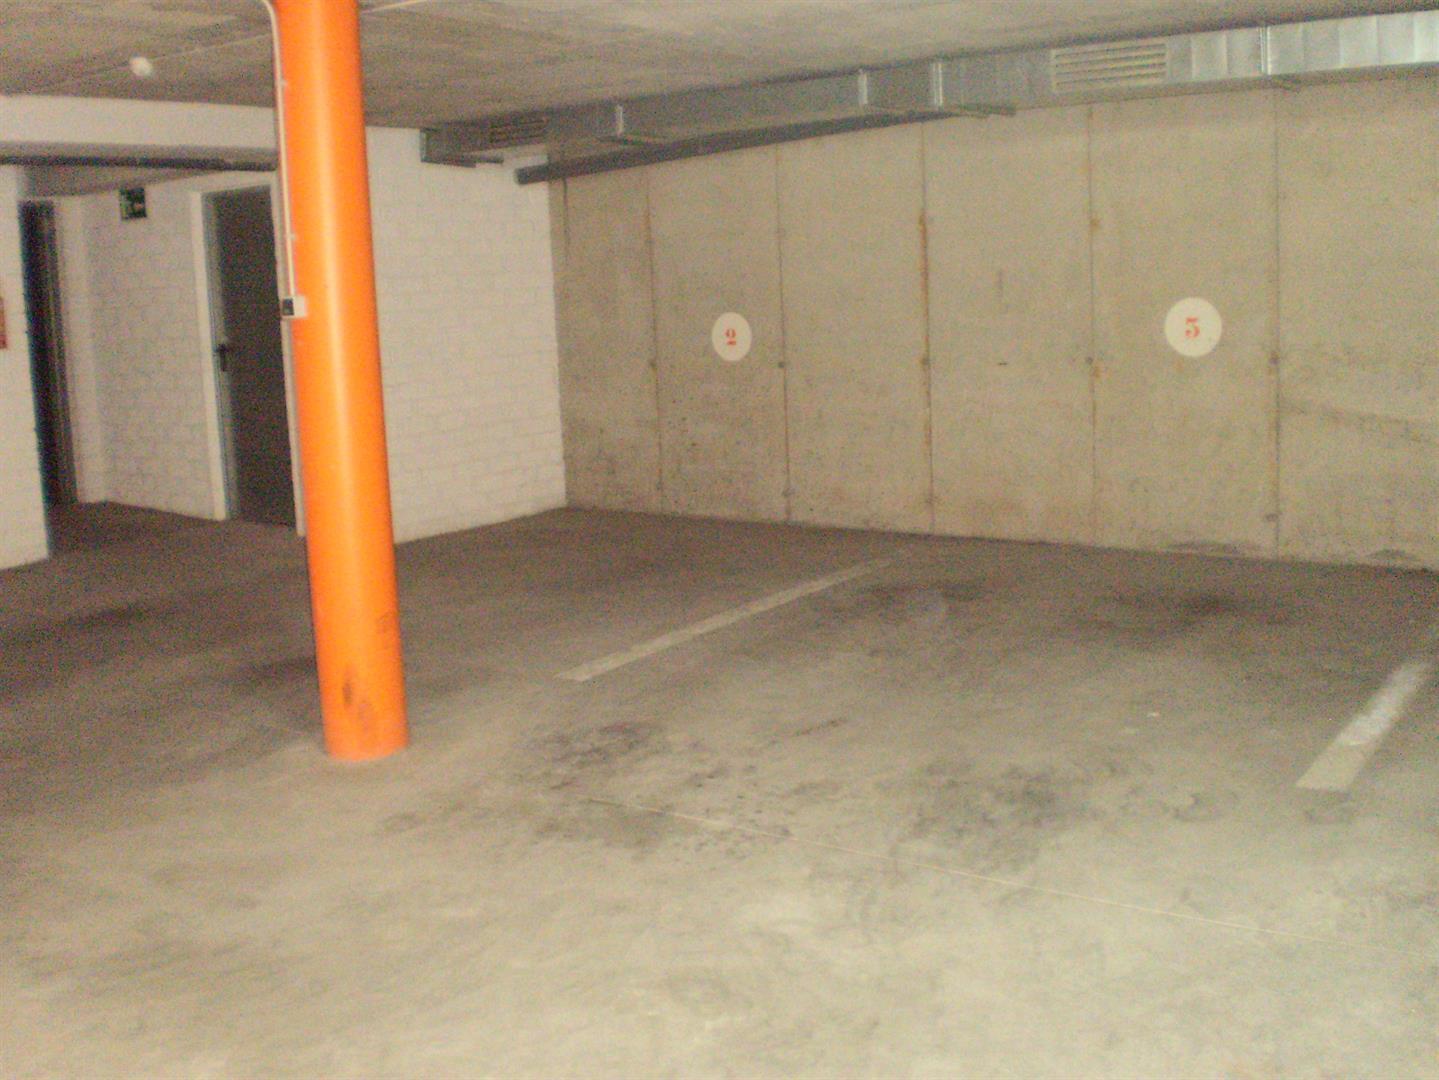 Alquiler Parking coche  Plaza carrer migdia, 4. Plaza de aparcamiento al centro de vilobí d'onyar